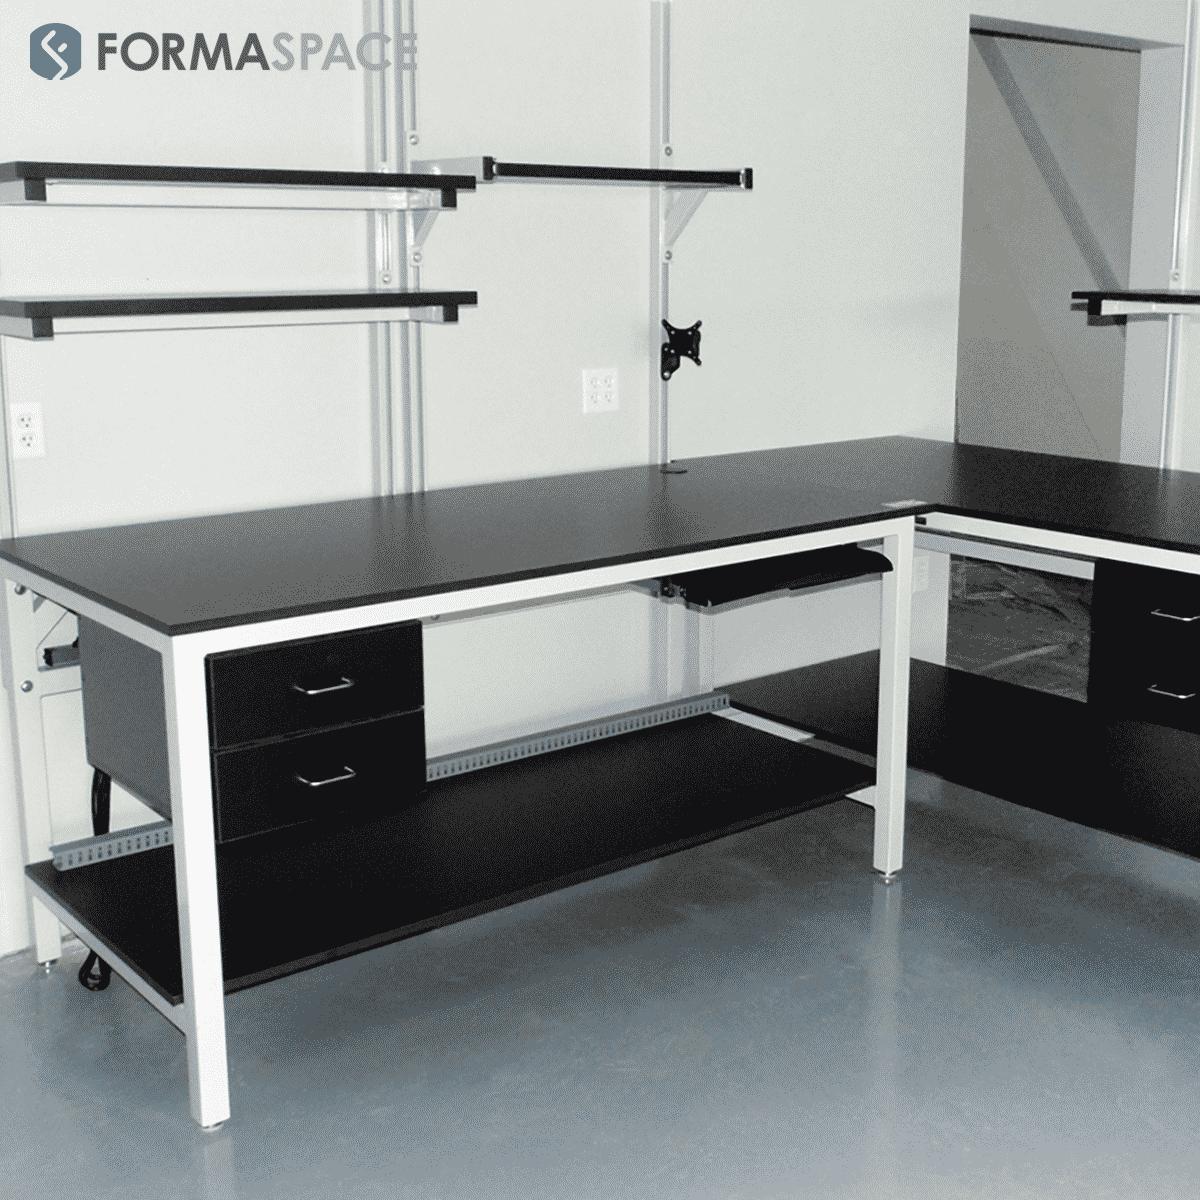 modular laboratory installation with benchmark